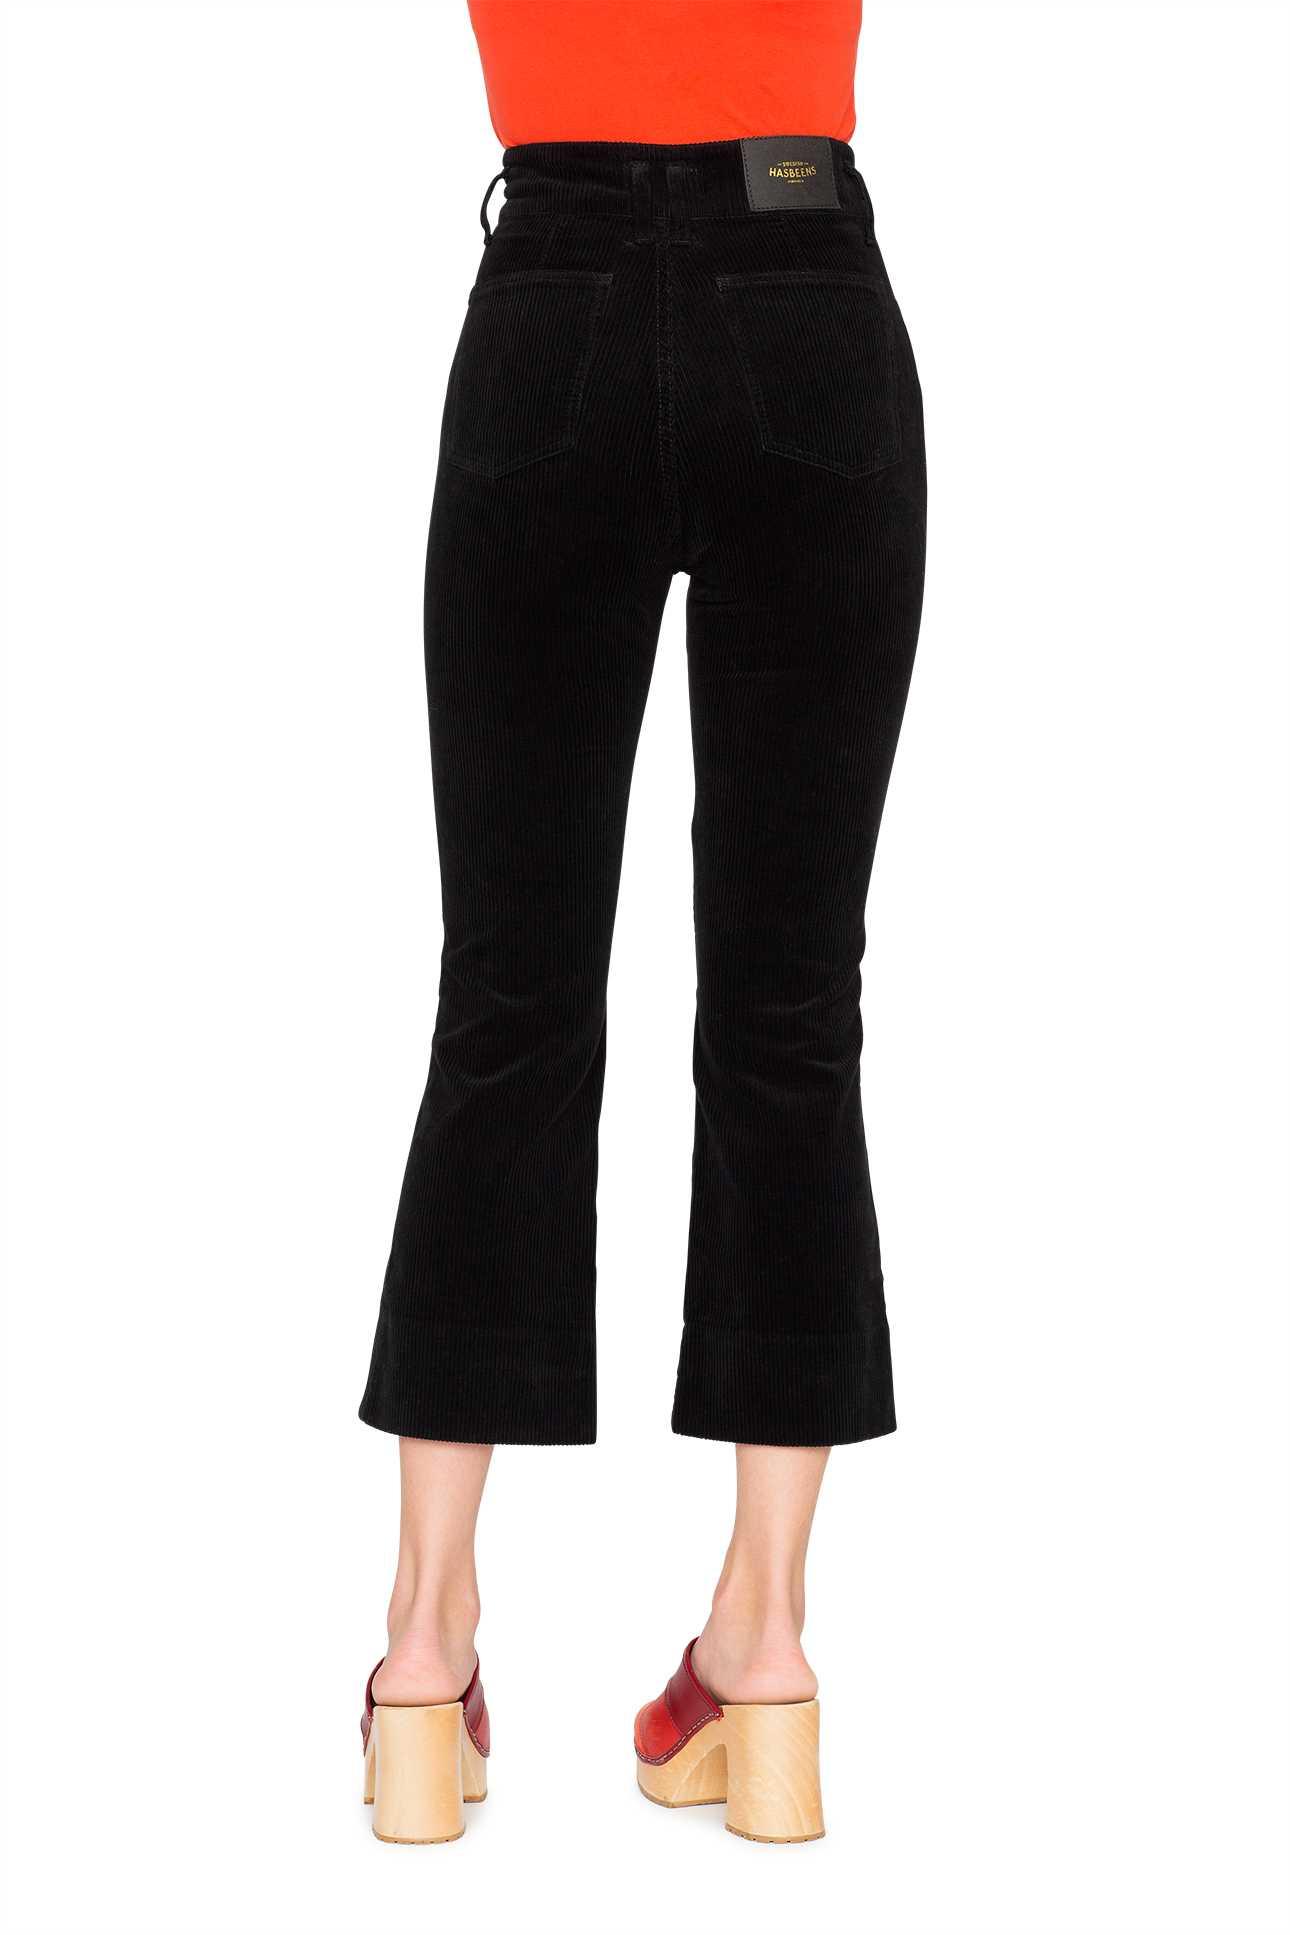 Product image Short Boot Cut Pants Cord